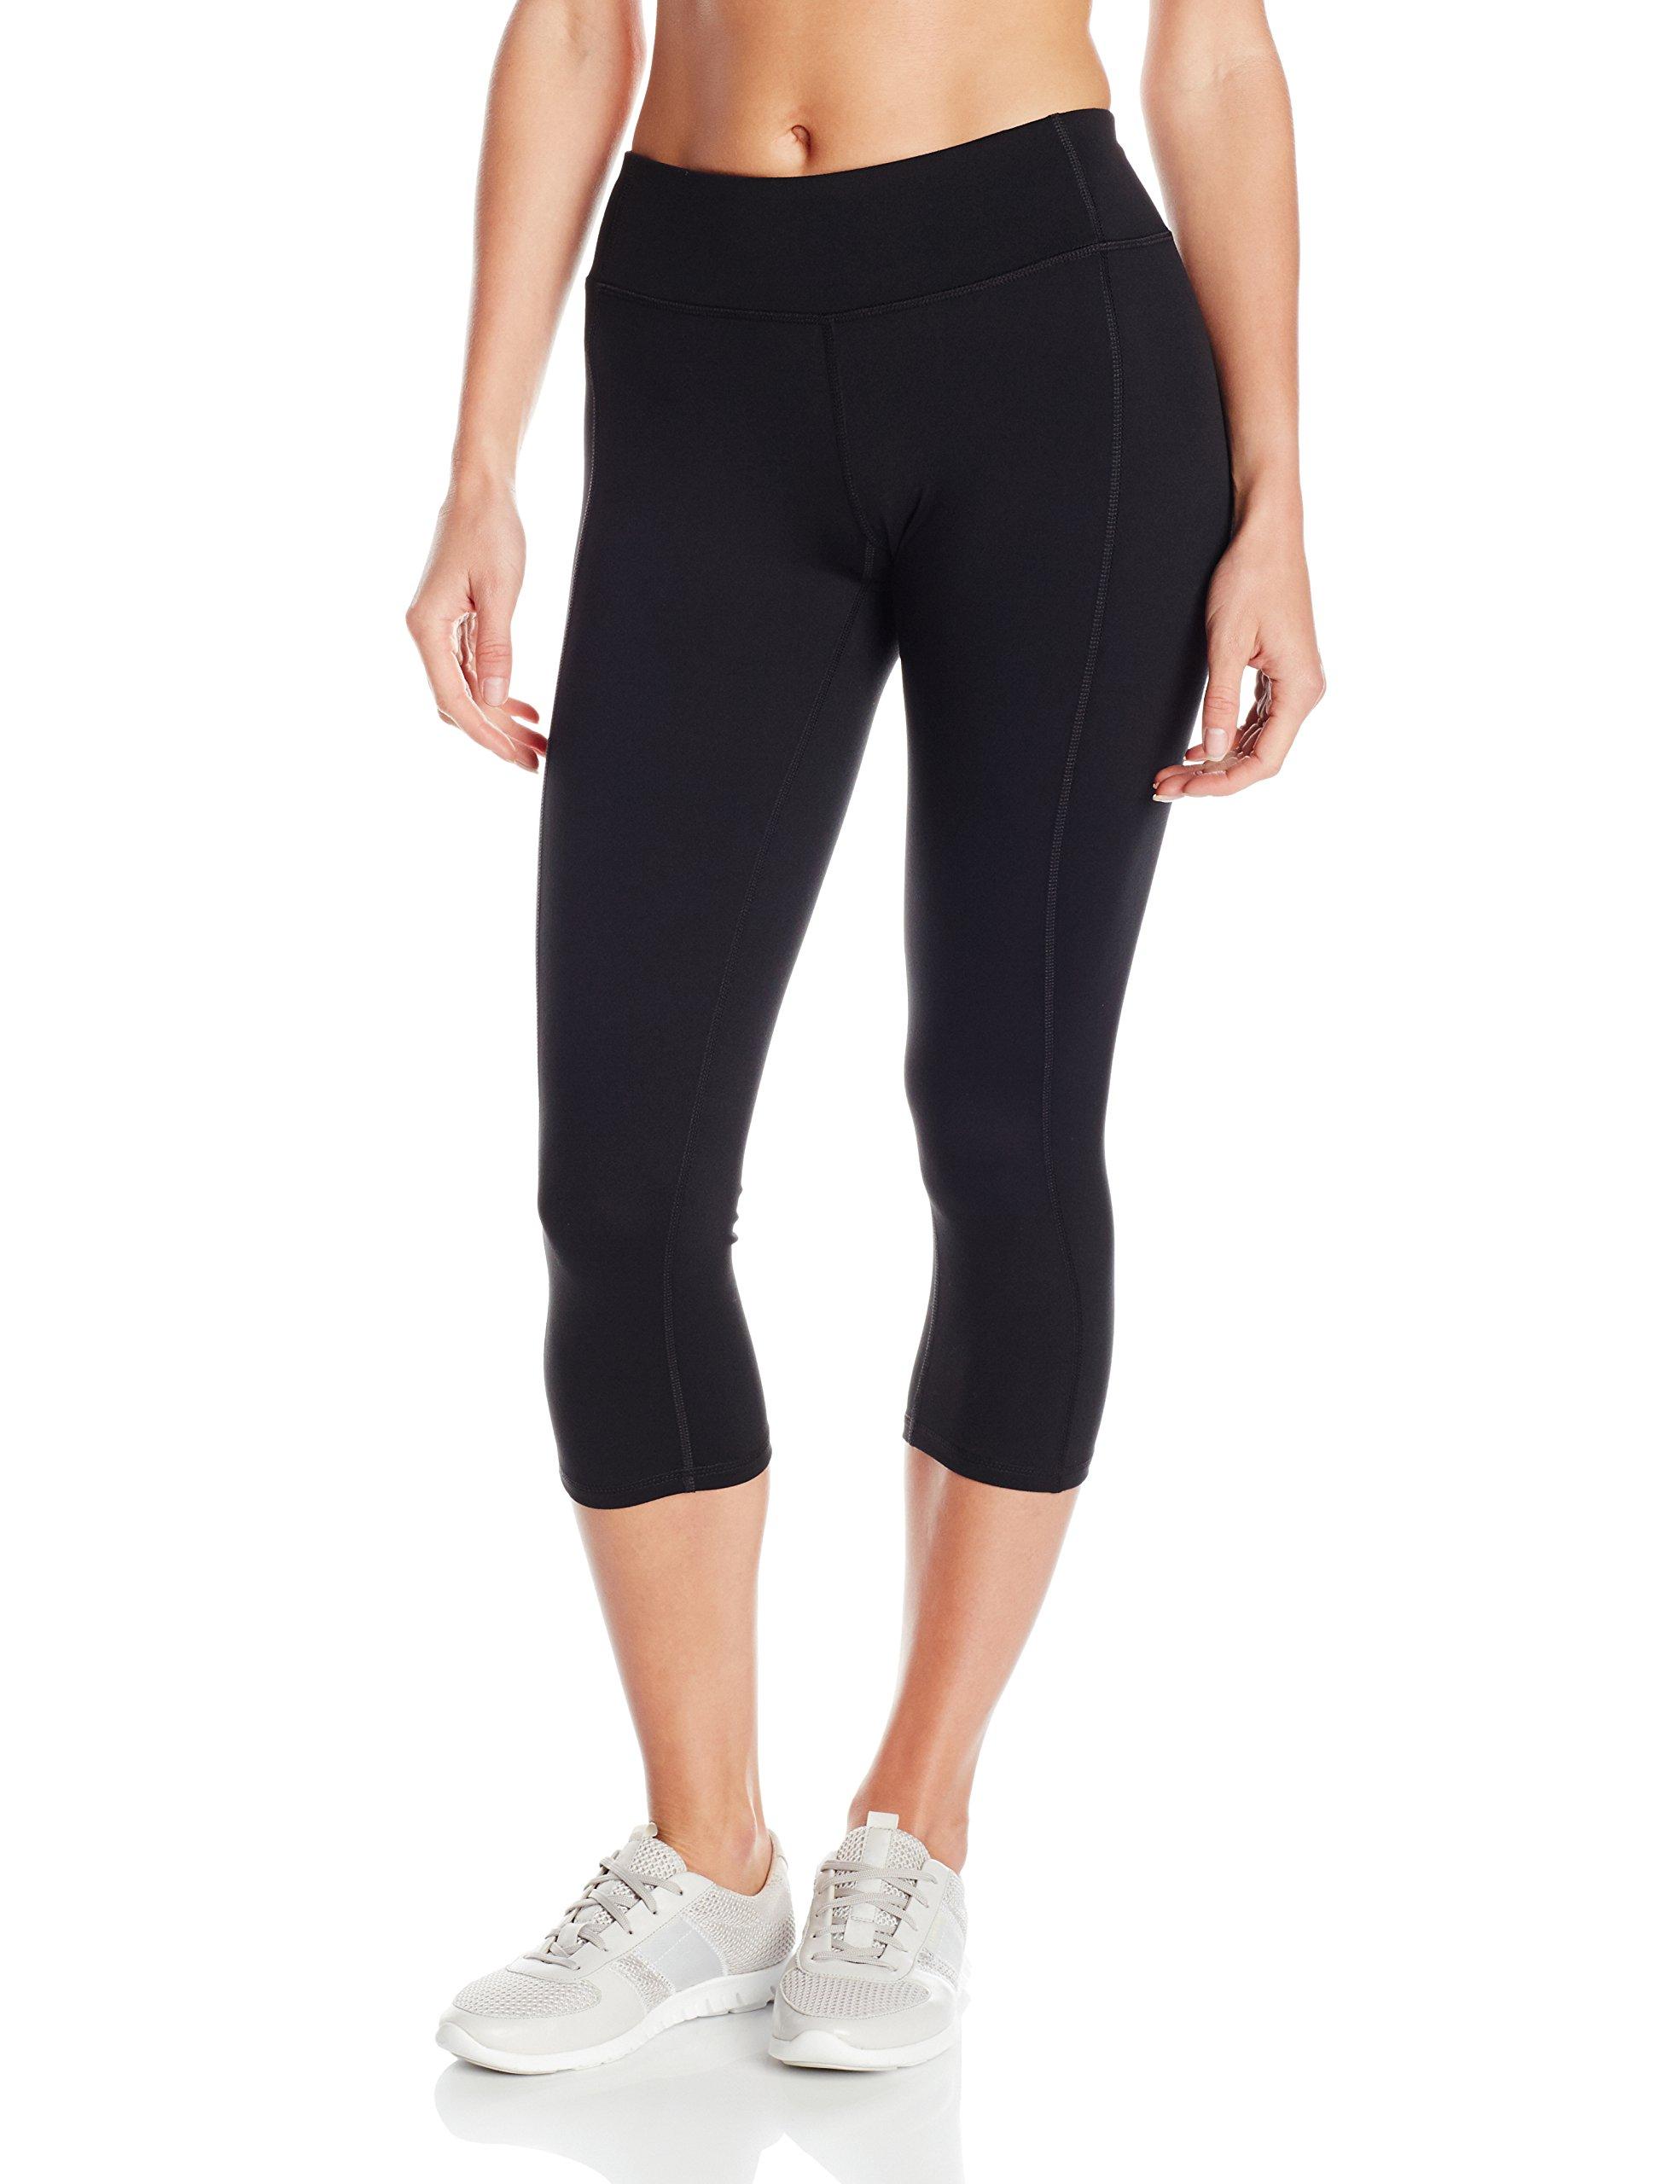 Hanes Women's Sport Performance Capri Legging, Ebony, XX-Large